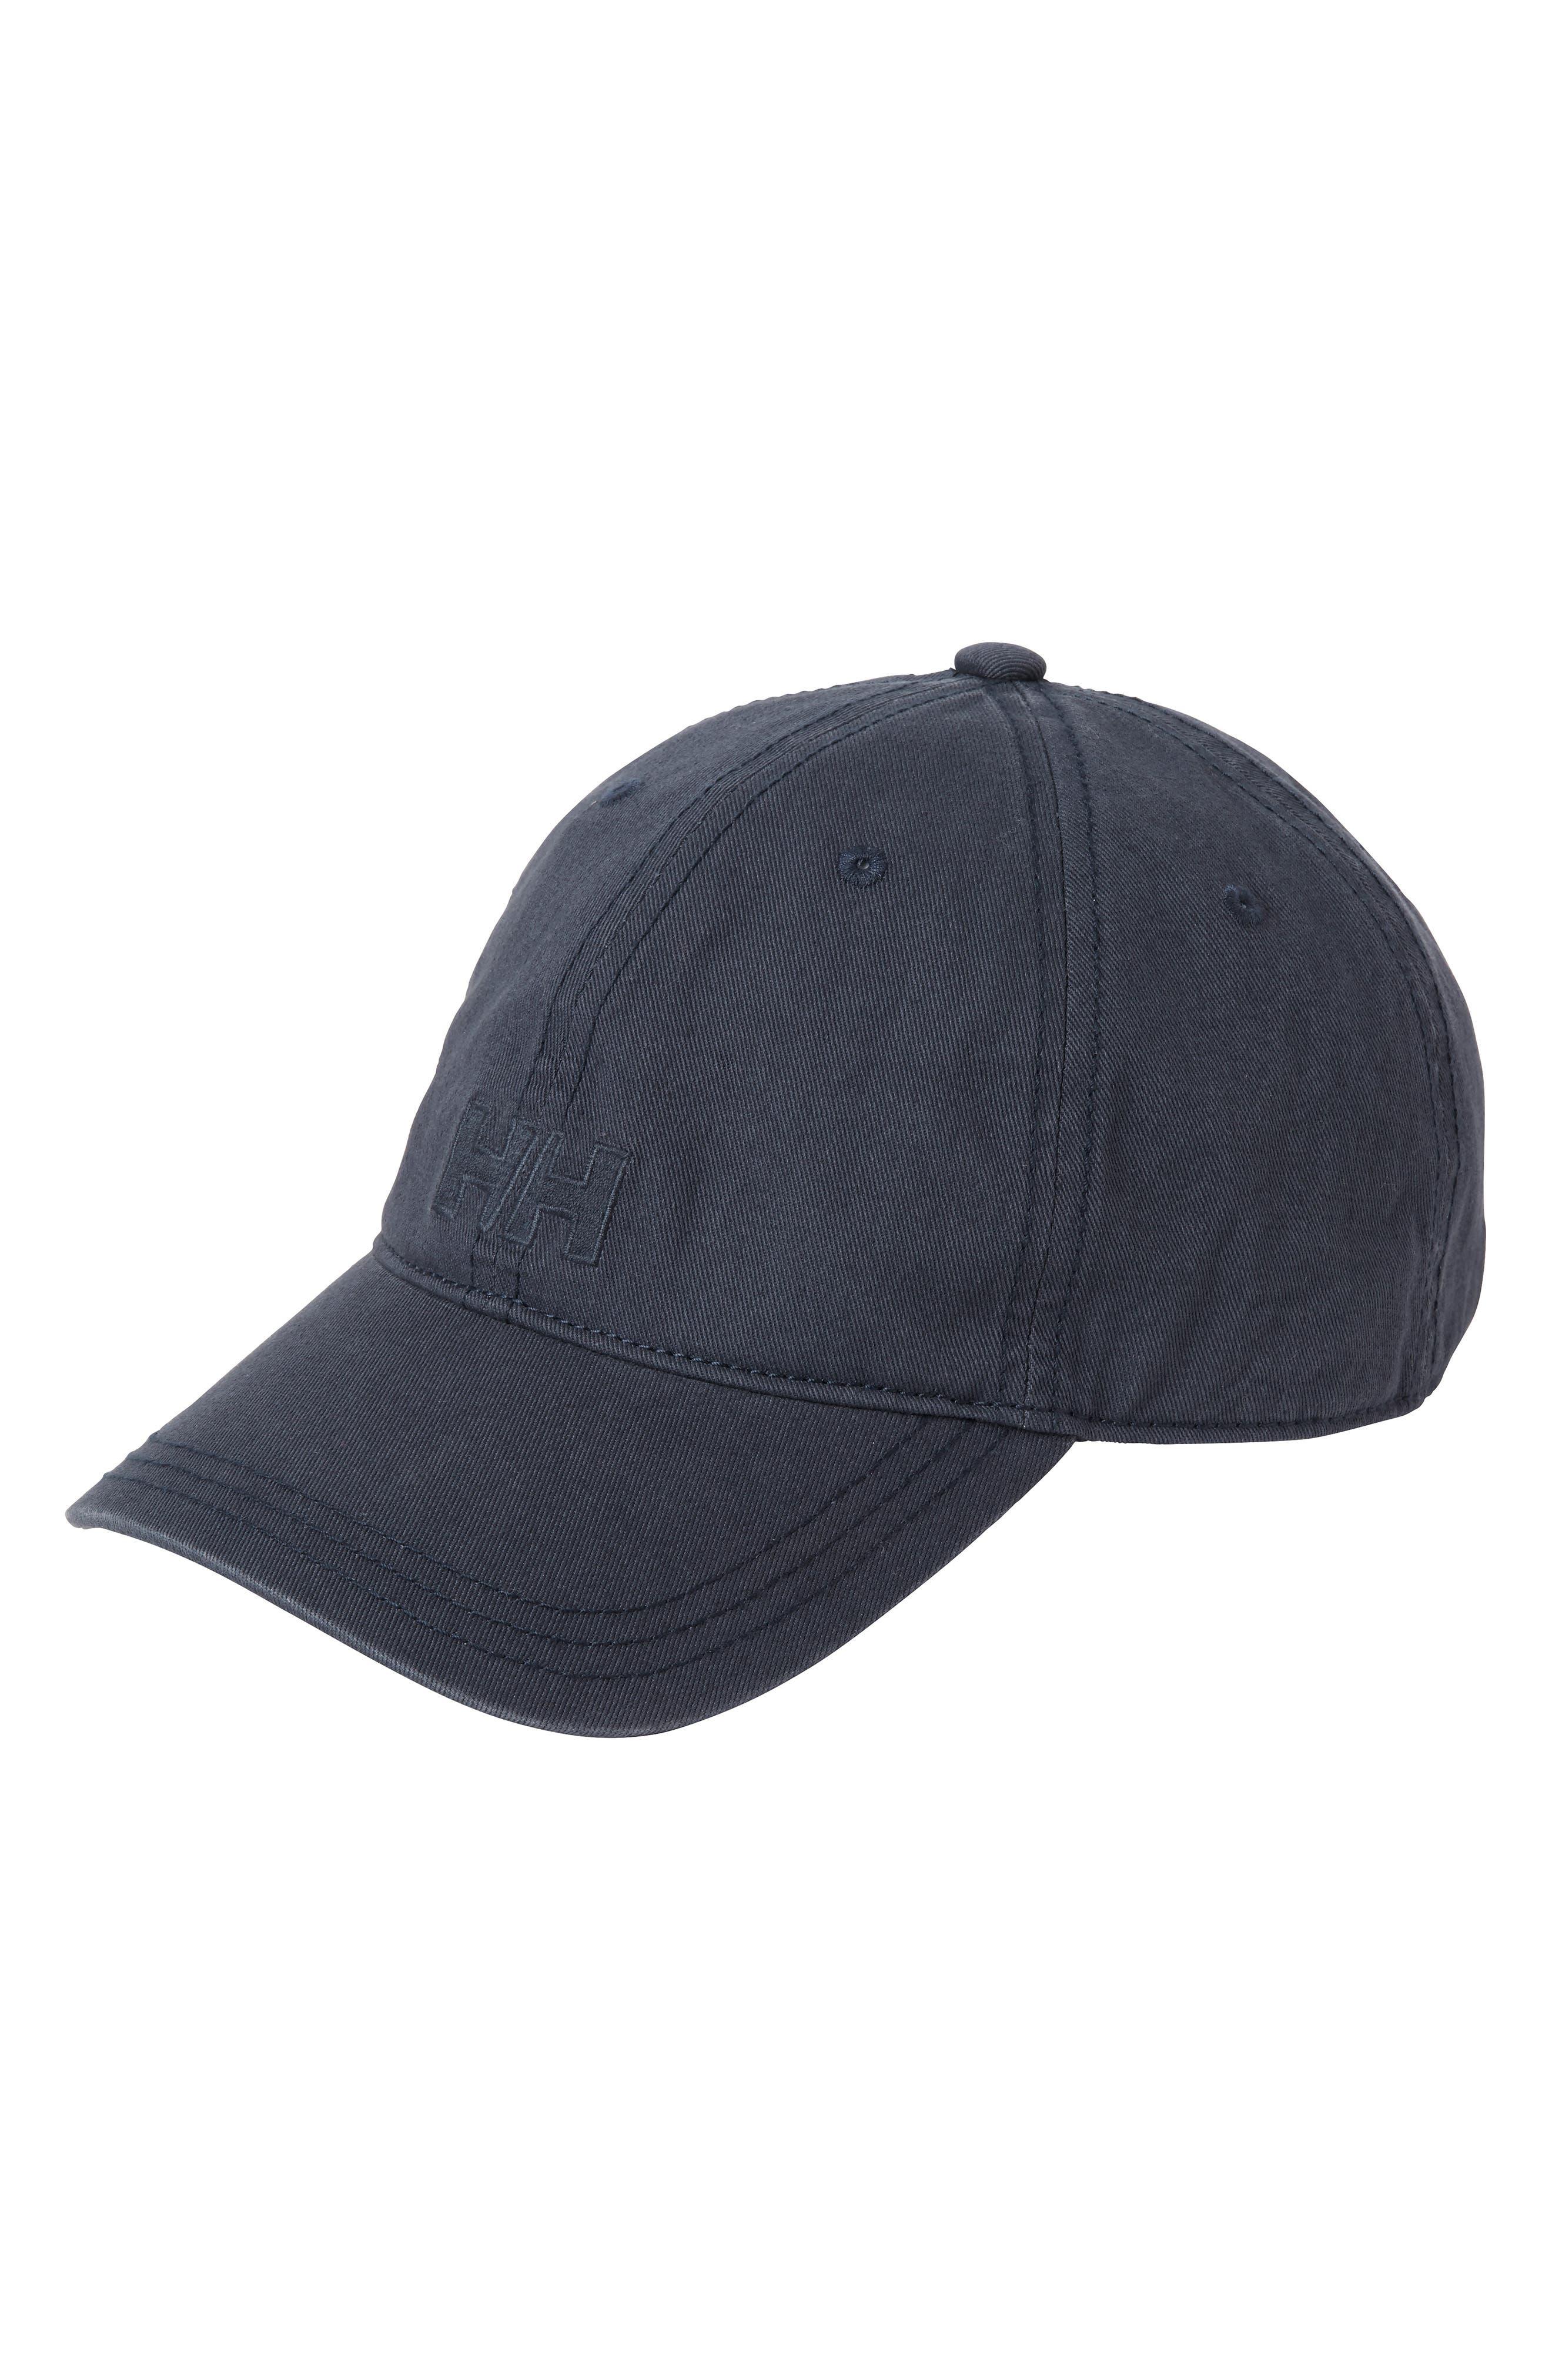 HELLY HANSEN Logo Baseball Cap - Grey in Graphite Blue